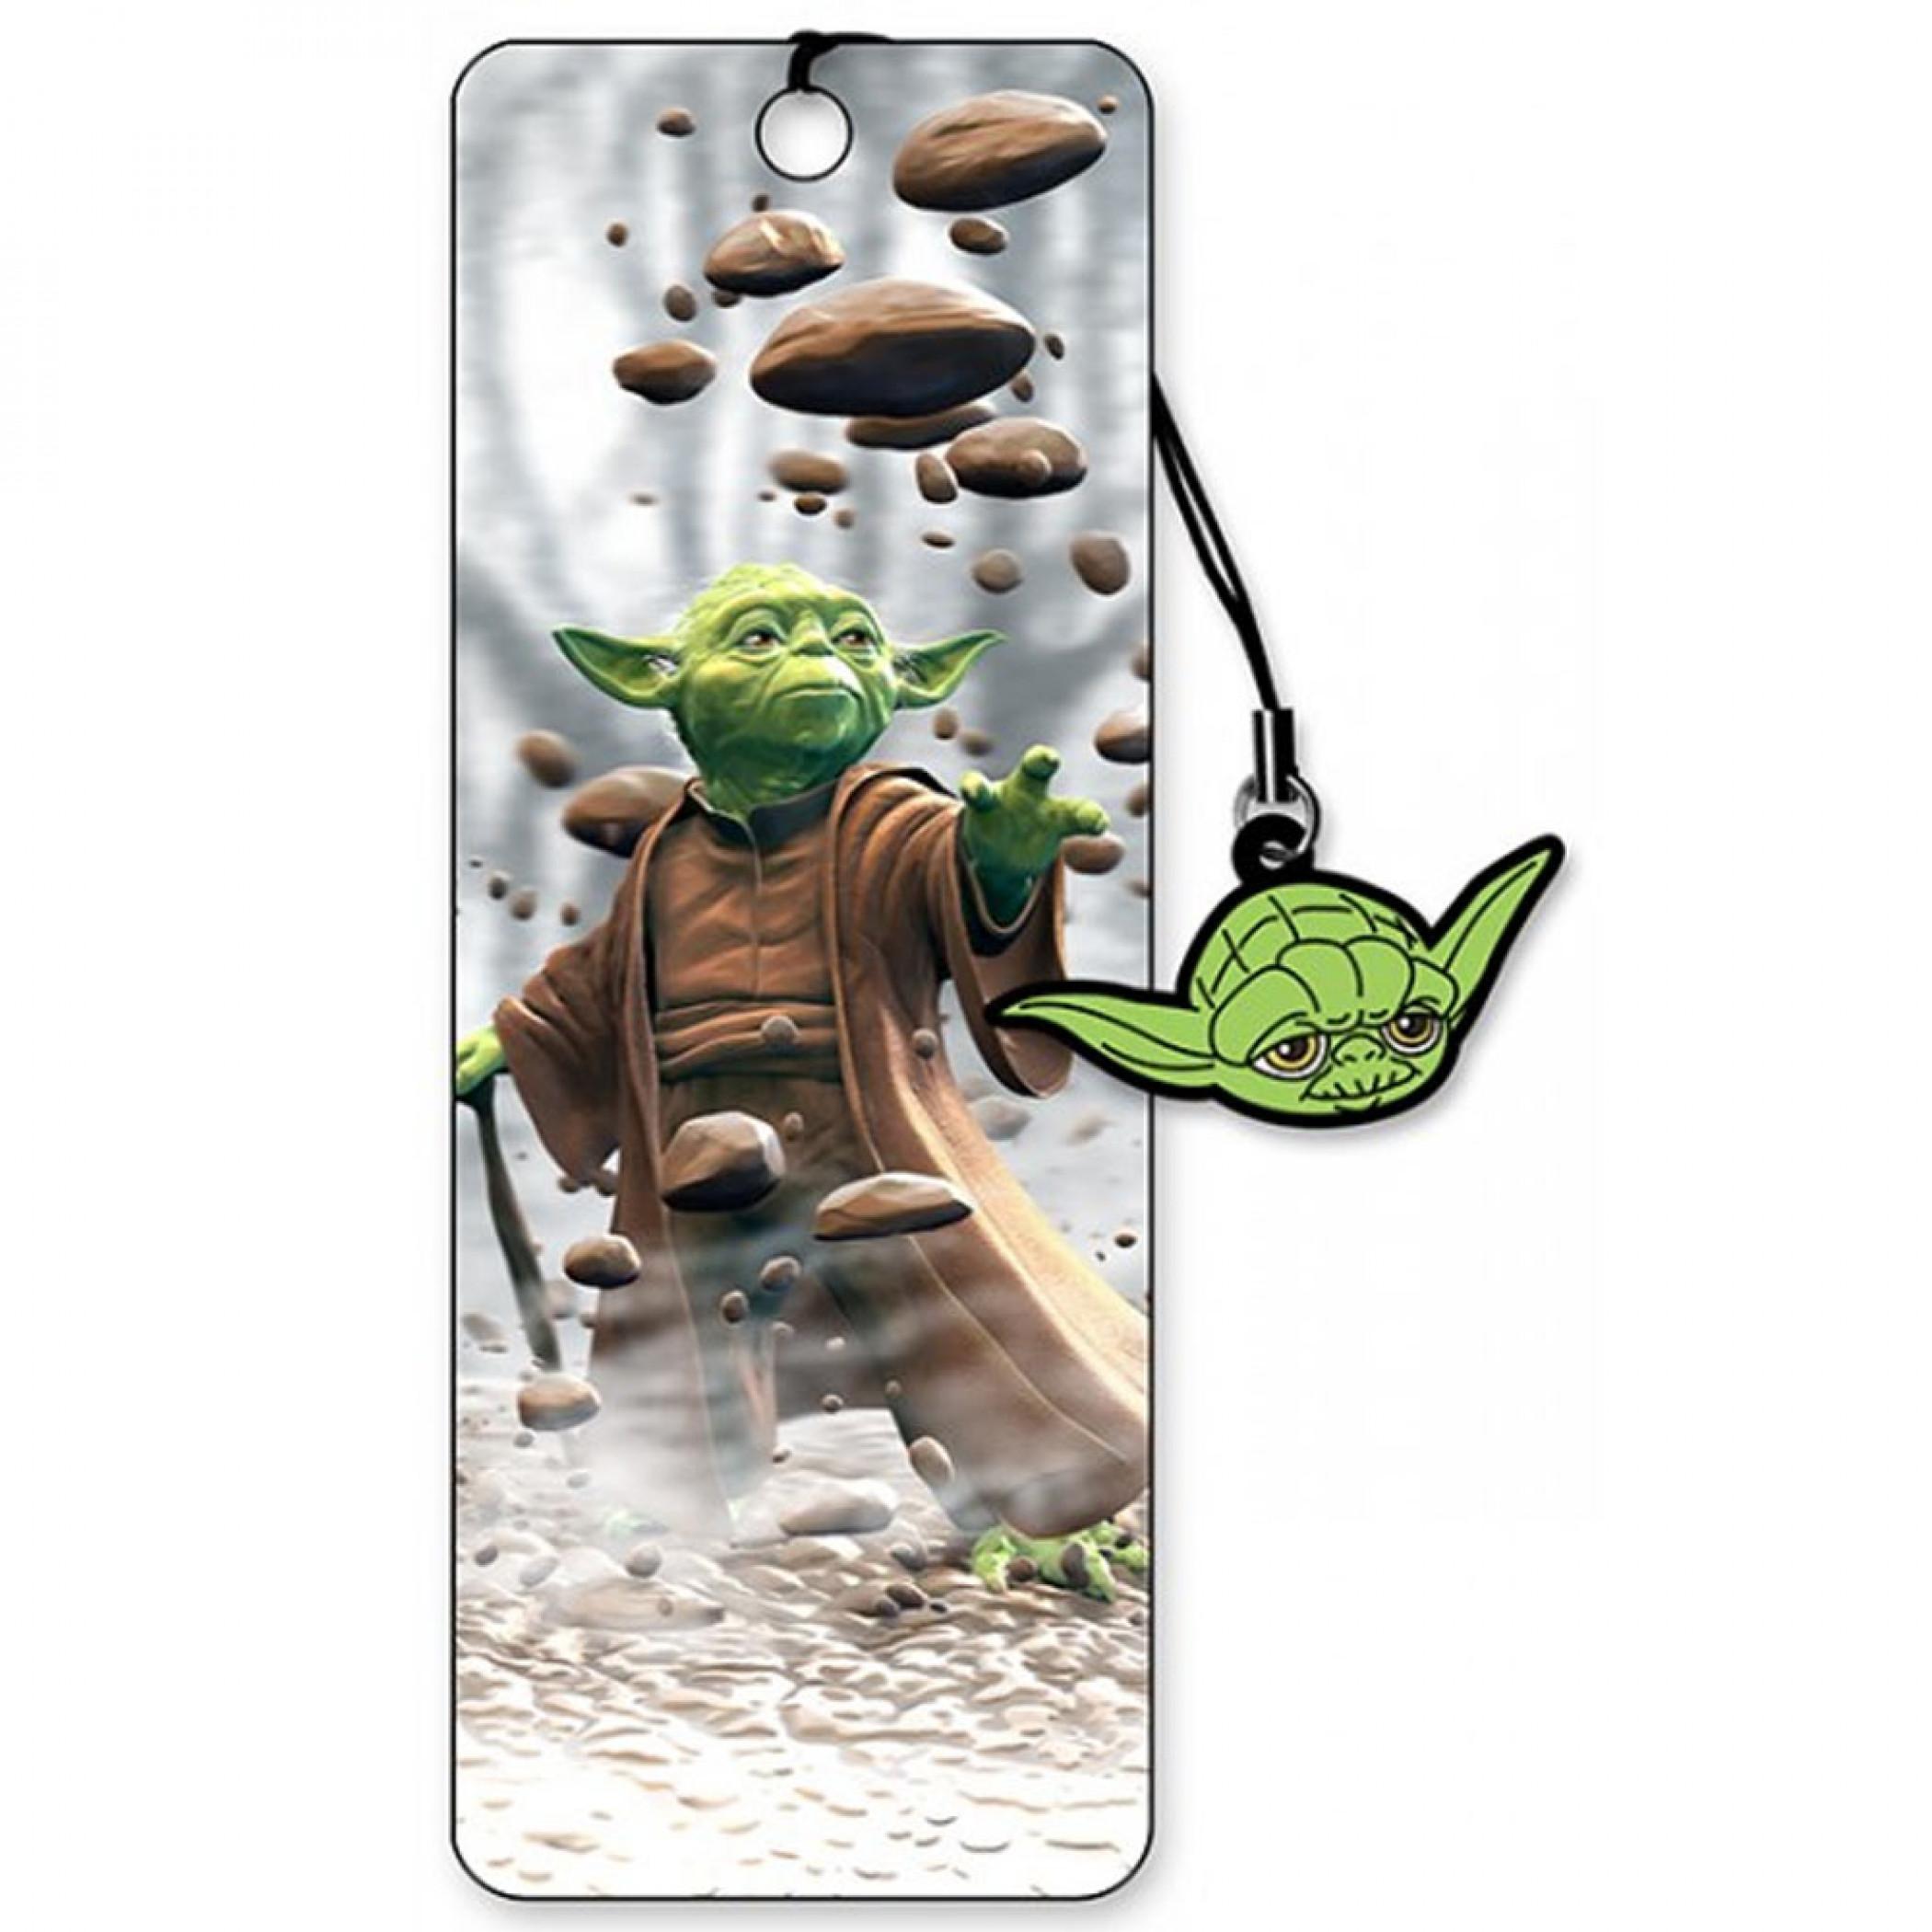 Yoda 3D Moving Image Bookmark